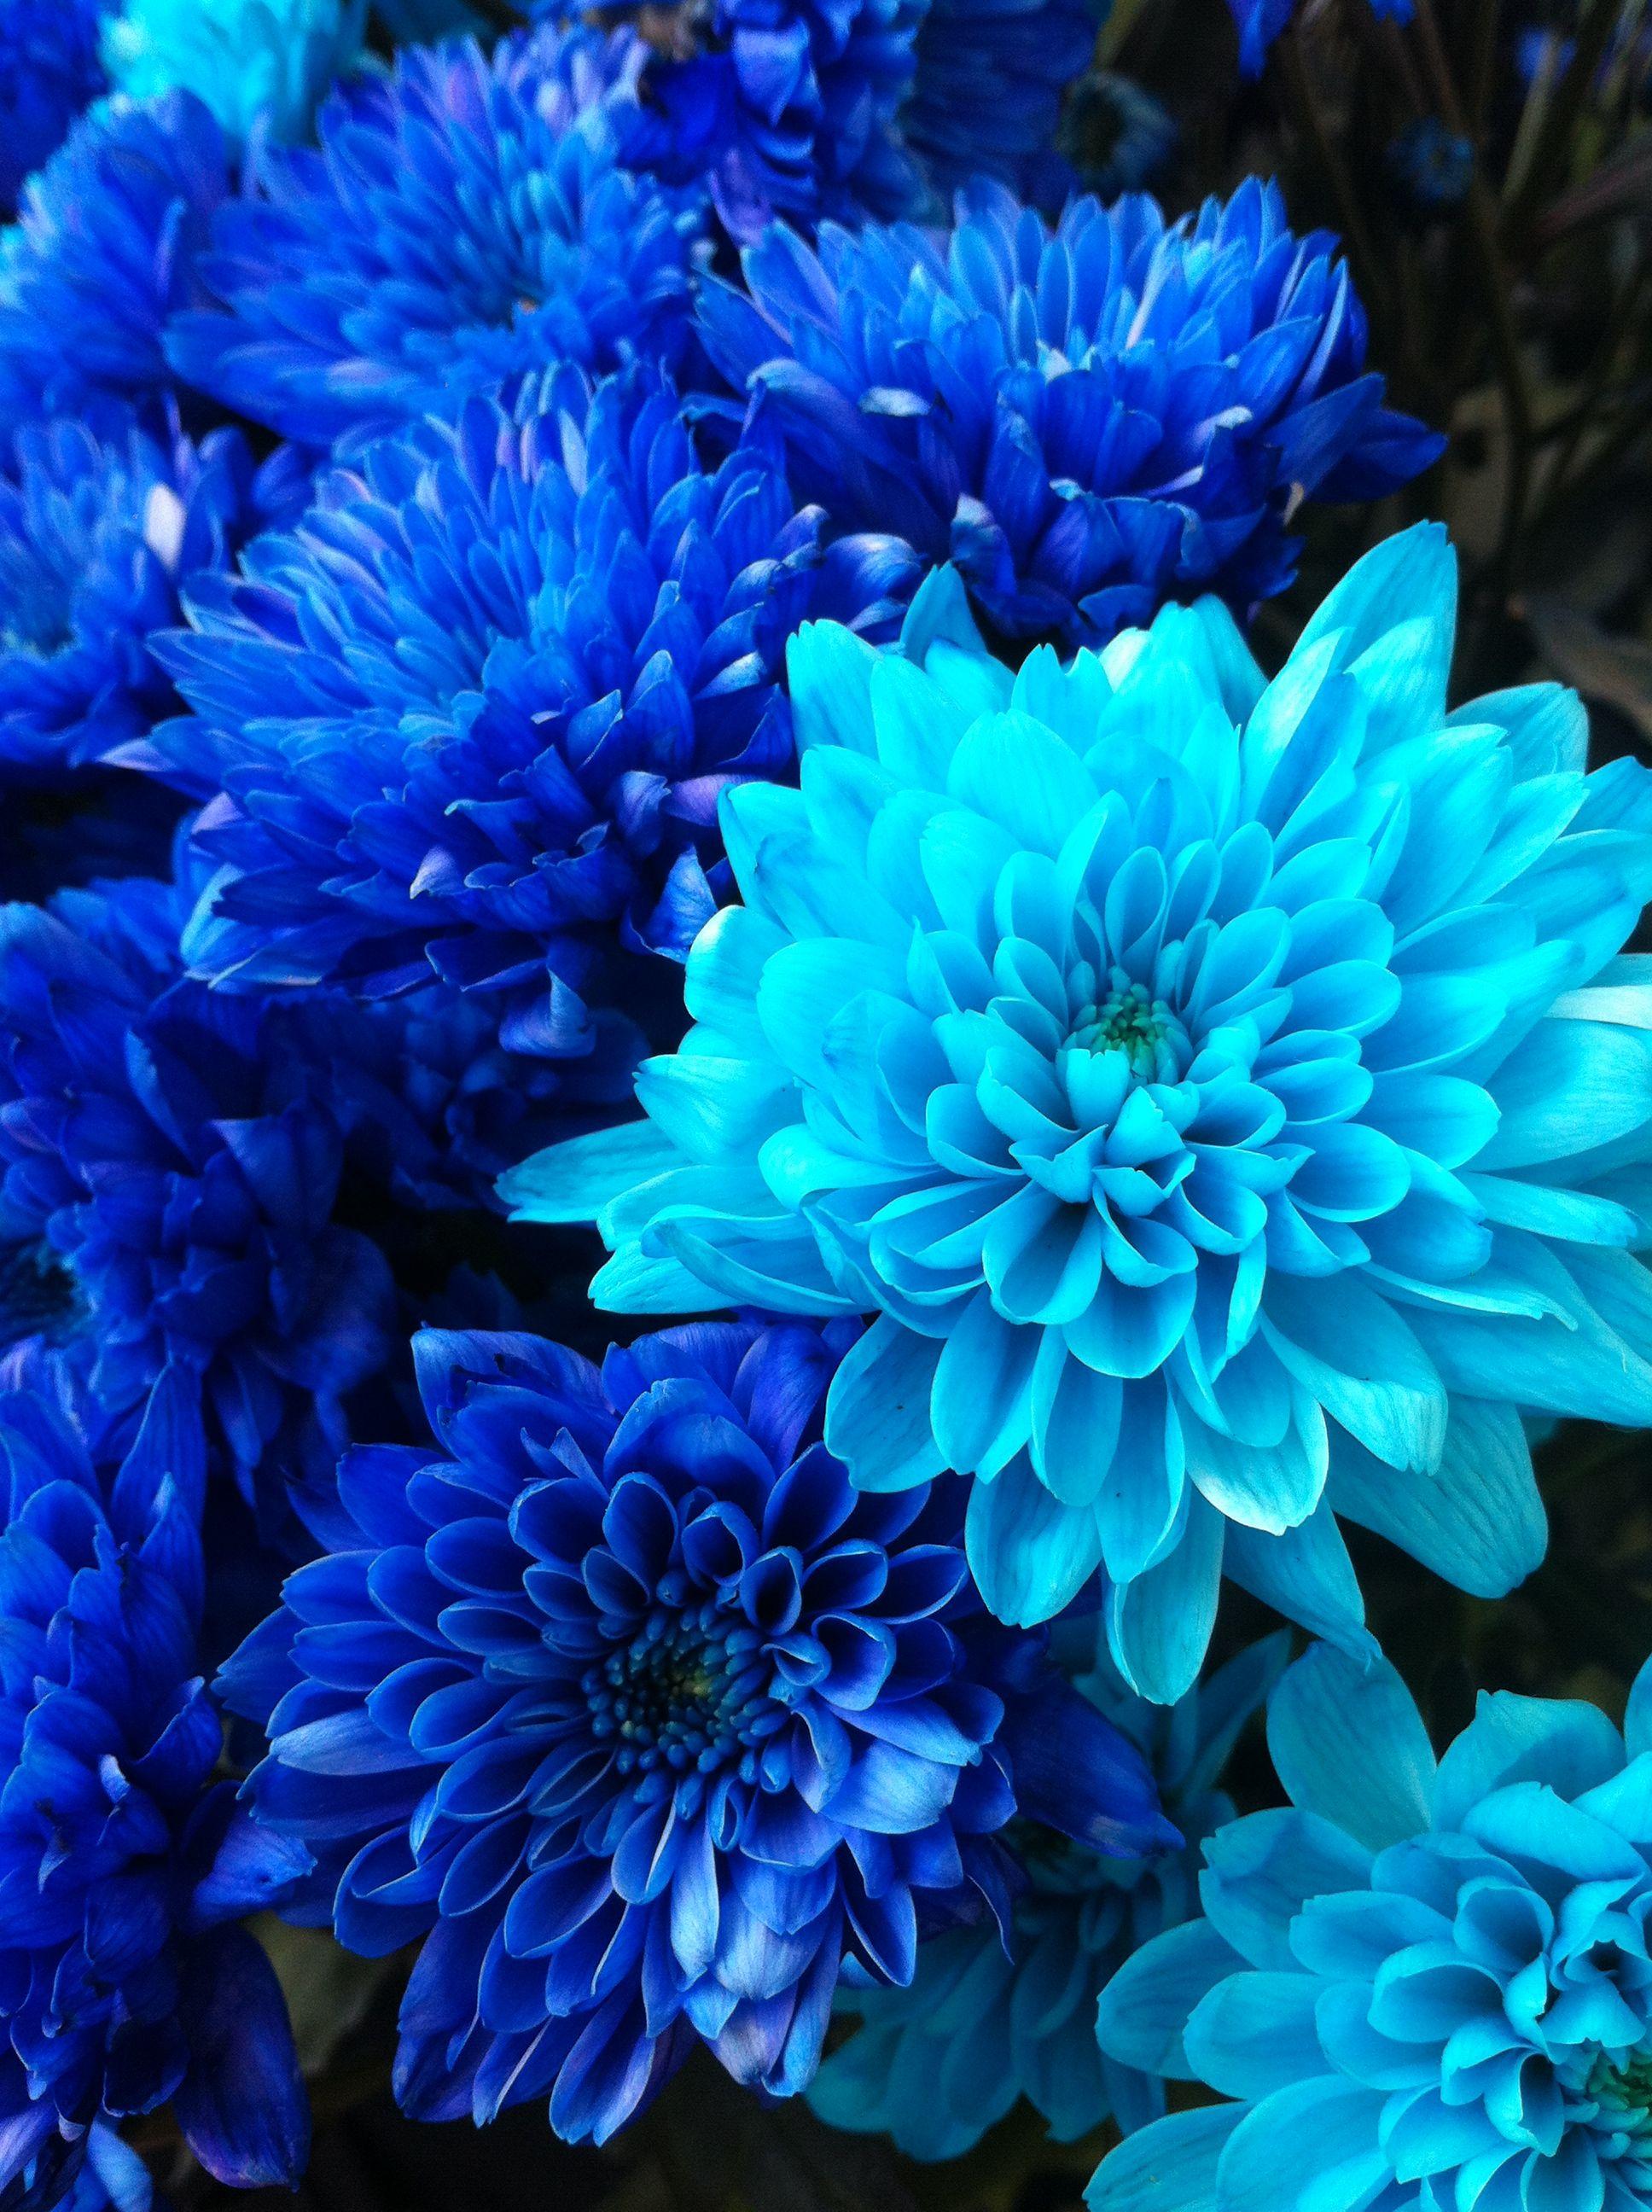 Blue flowers Blue flowers garden, Flower aesthetic, Blue